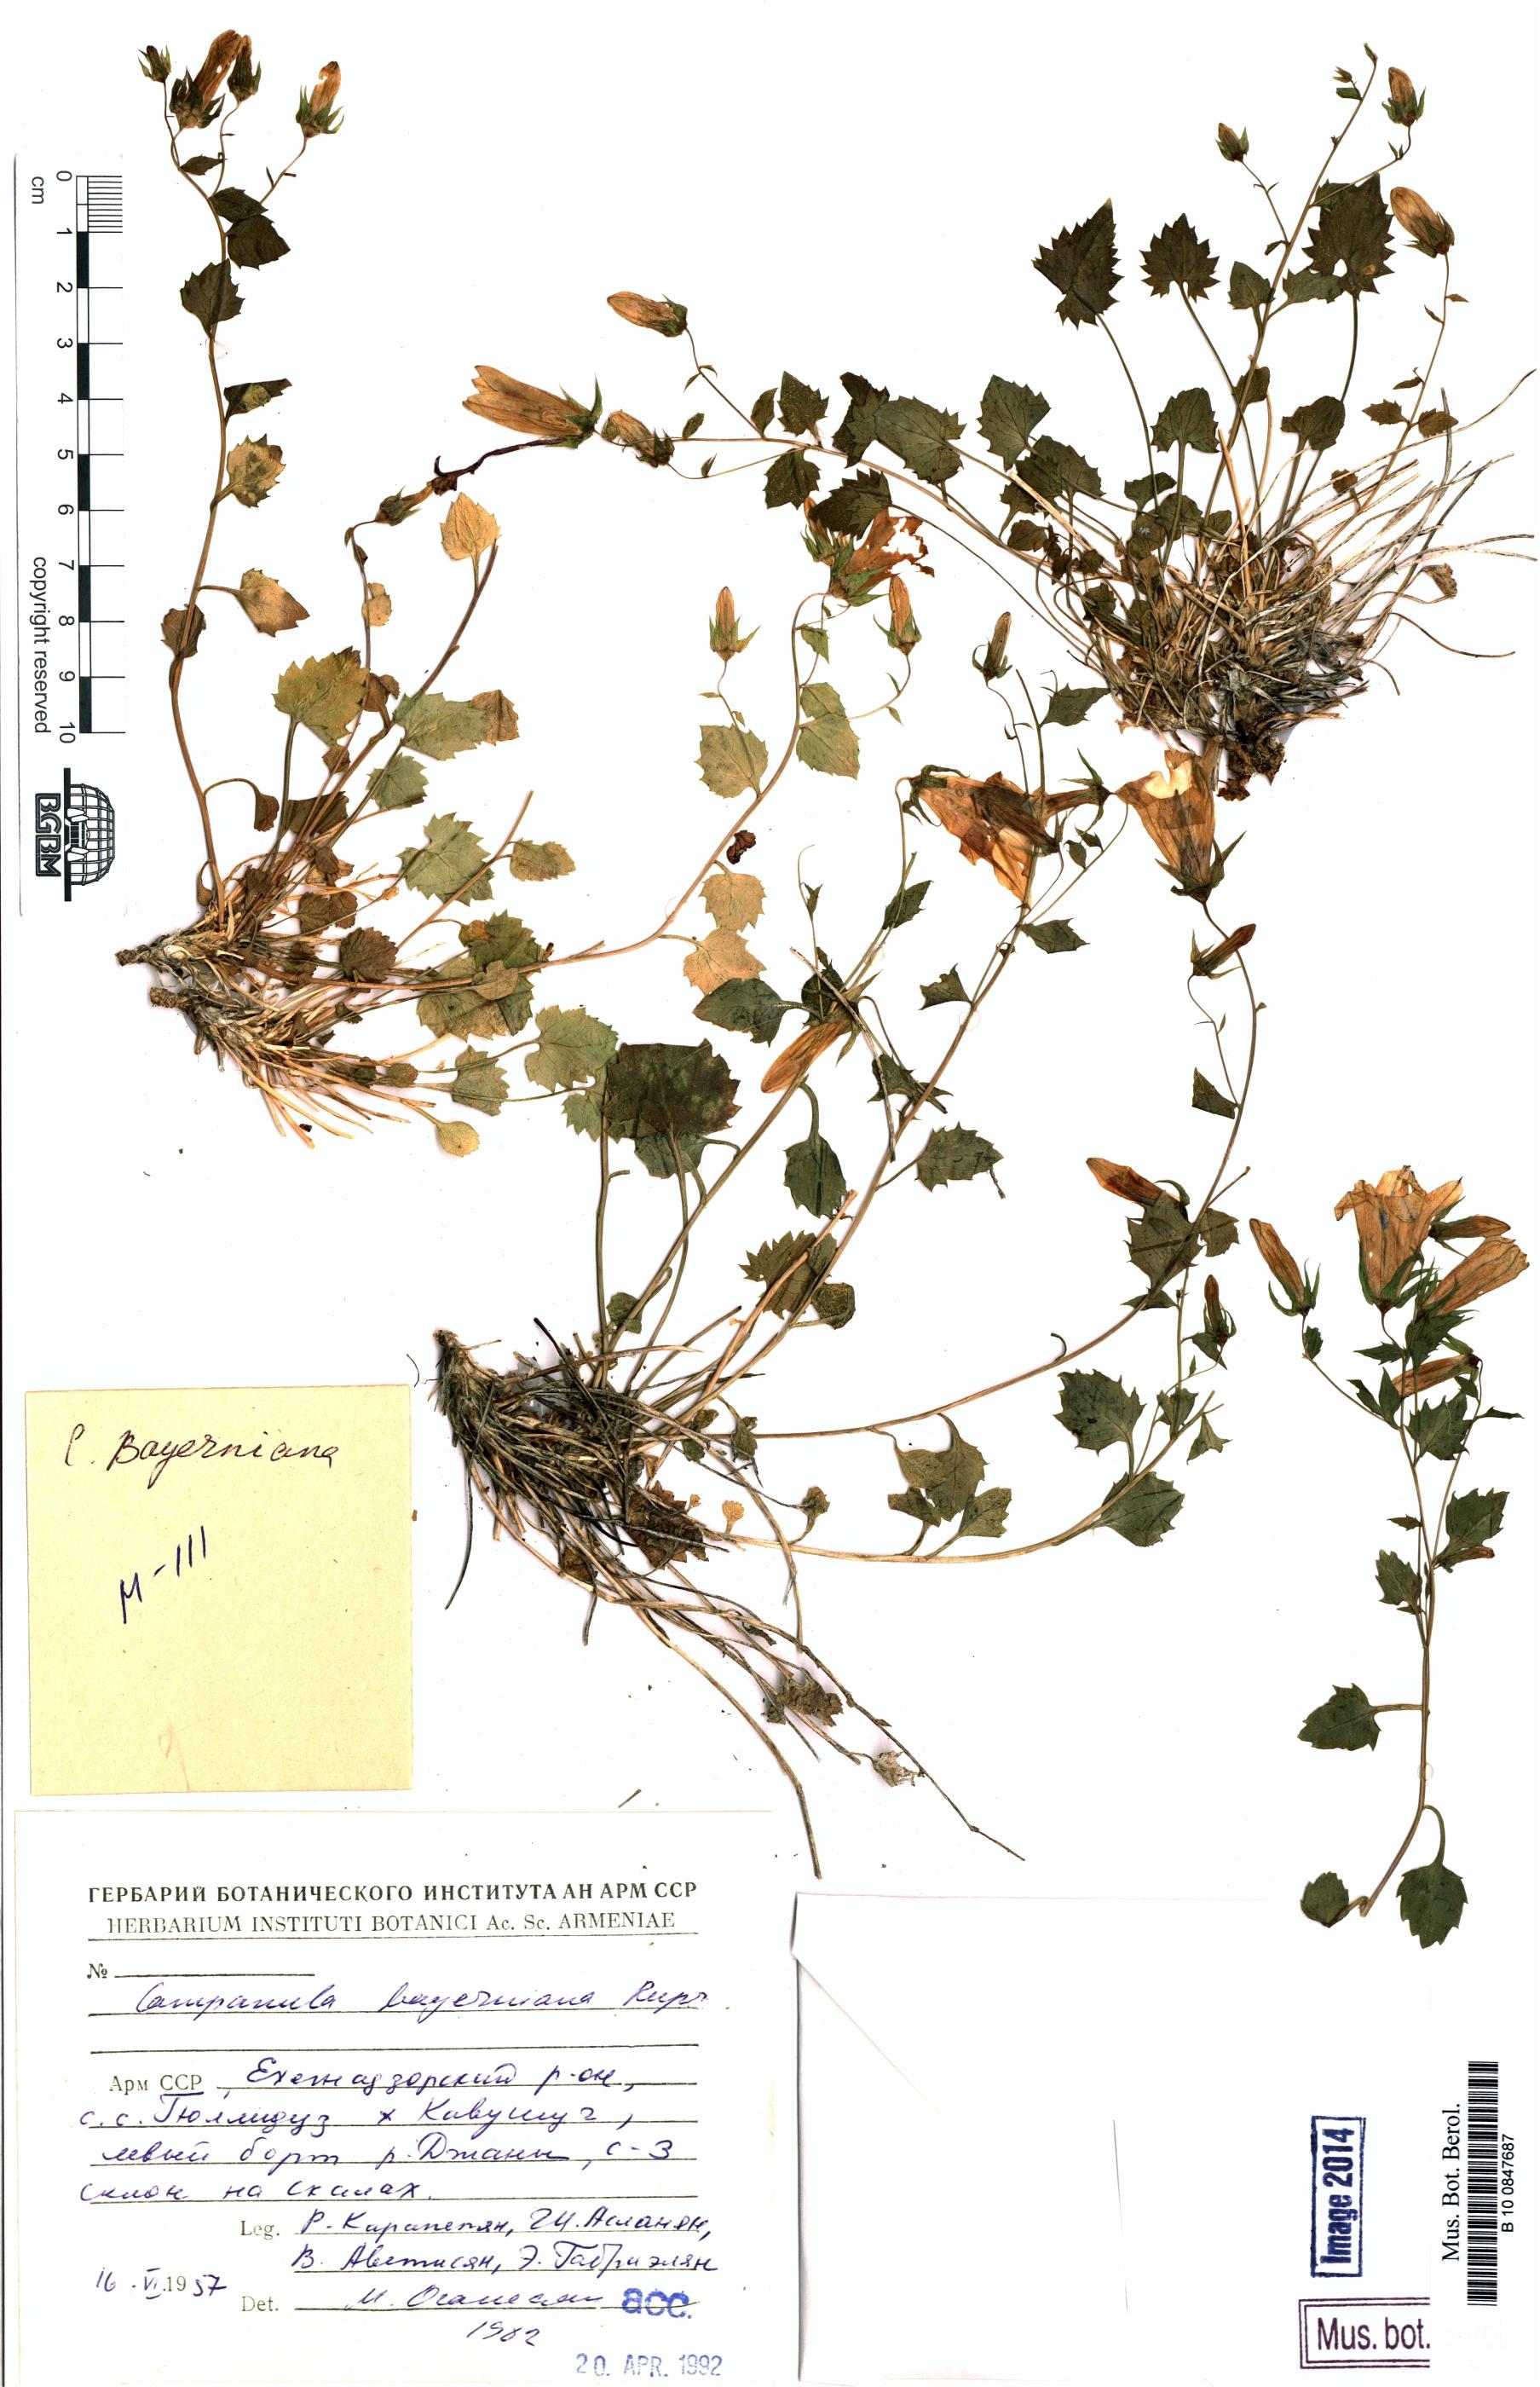 http://ww2.bgbm.org/herbarium/images/B/10/08/47/68/B_10_0847687.jpg